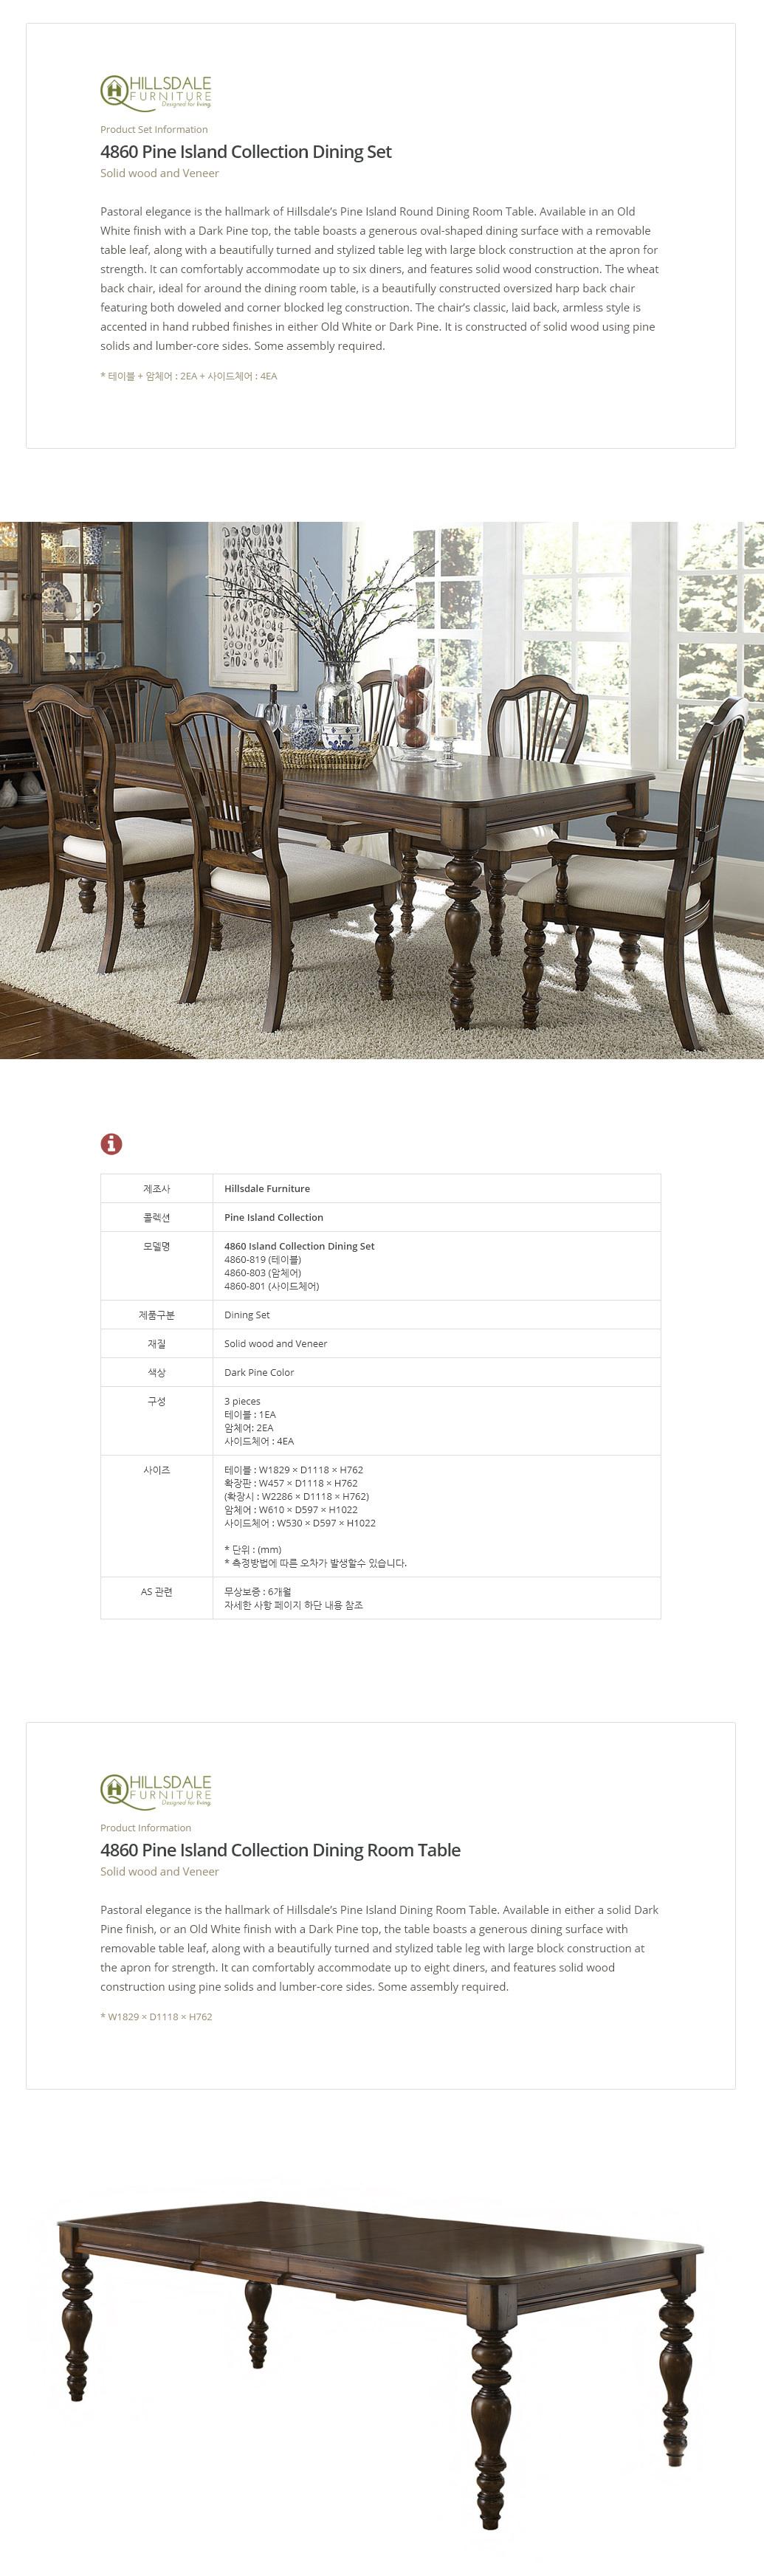 4860_pinelsland_collection_dininig_01.jp